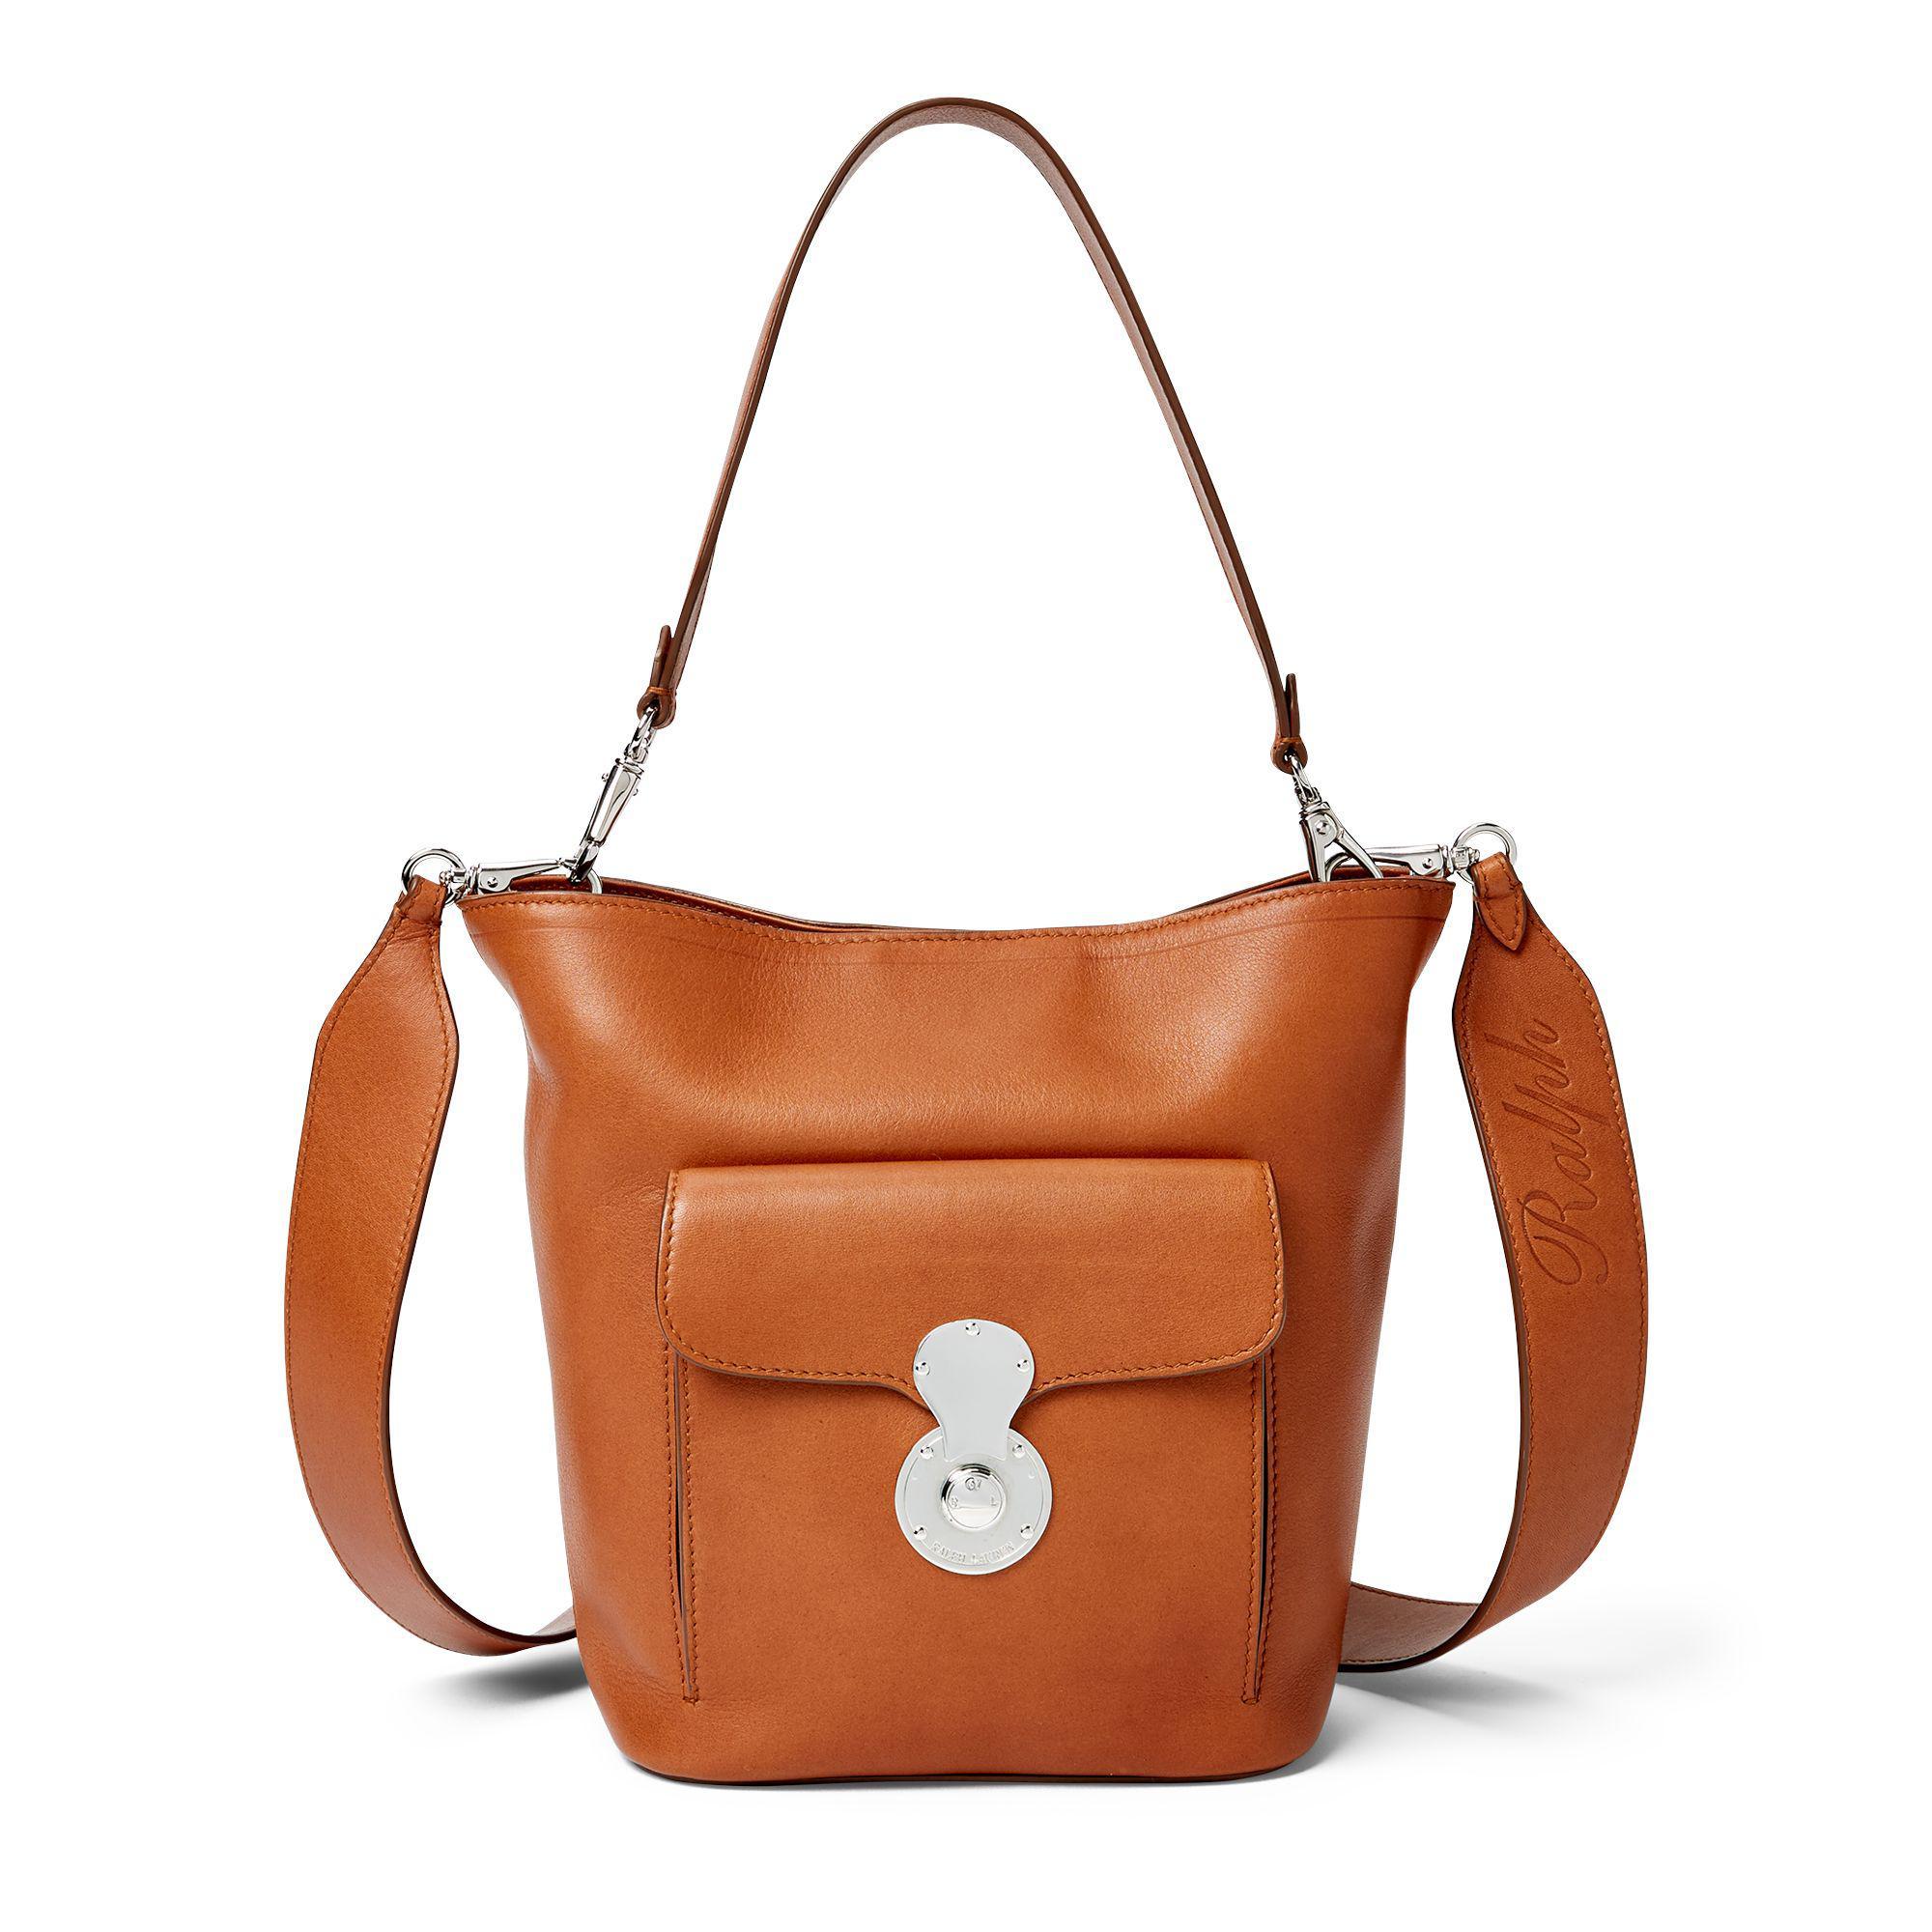 55c3435bae Ralph Lauren Calfskin Mini Rl Bucket Bag in Brown - Lyst